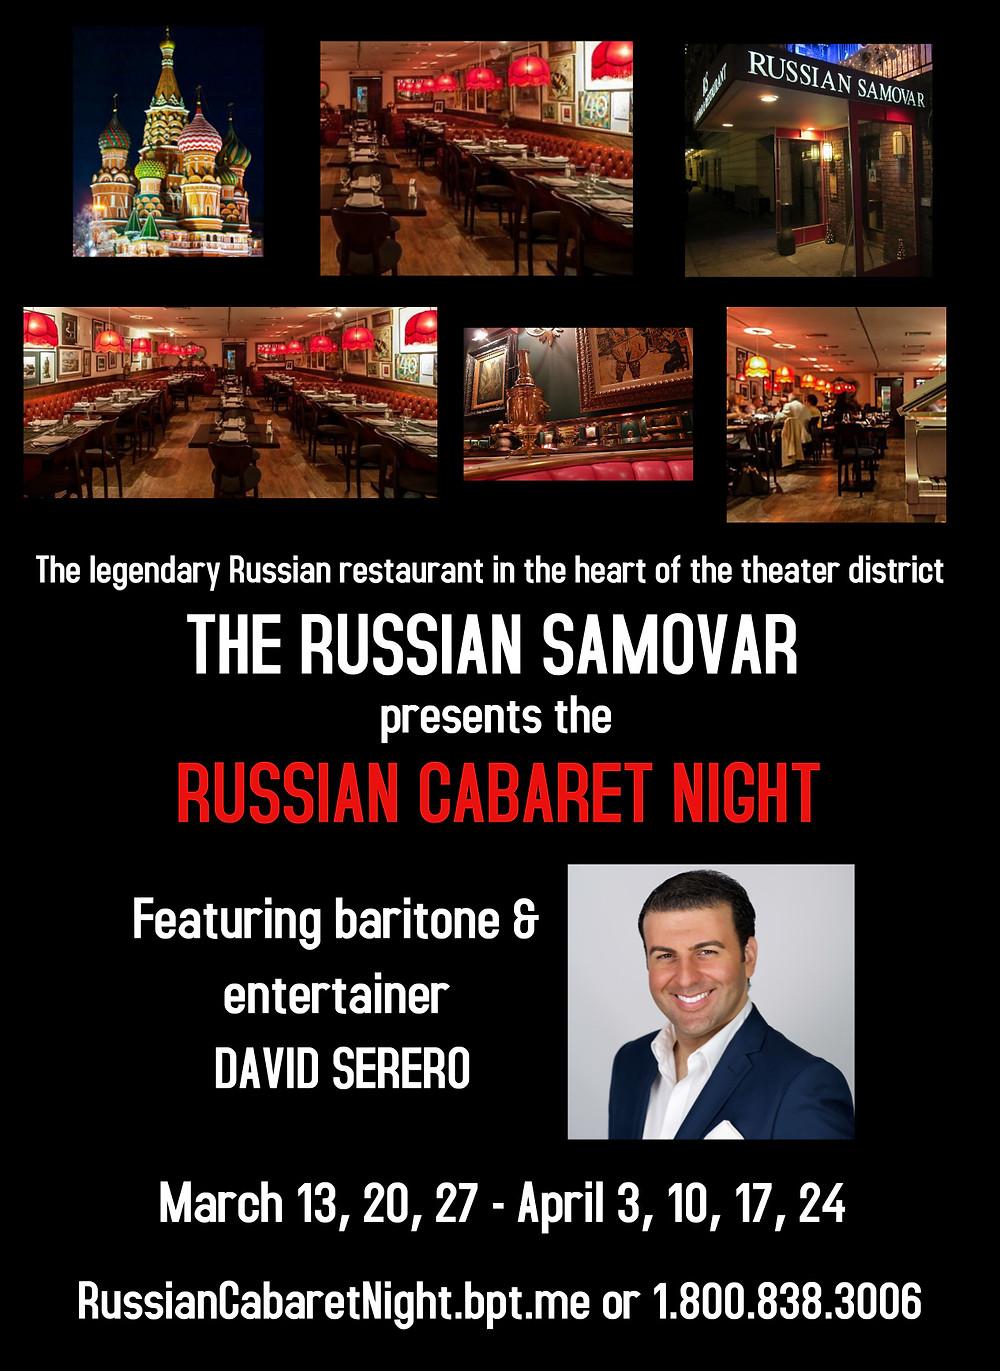 Russian Cabaret Night at the Russian Samovar featuring David Serero